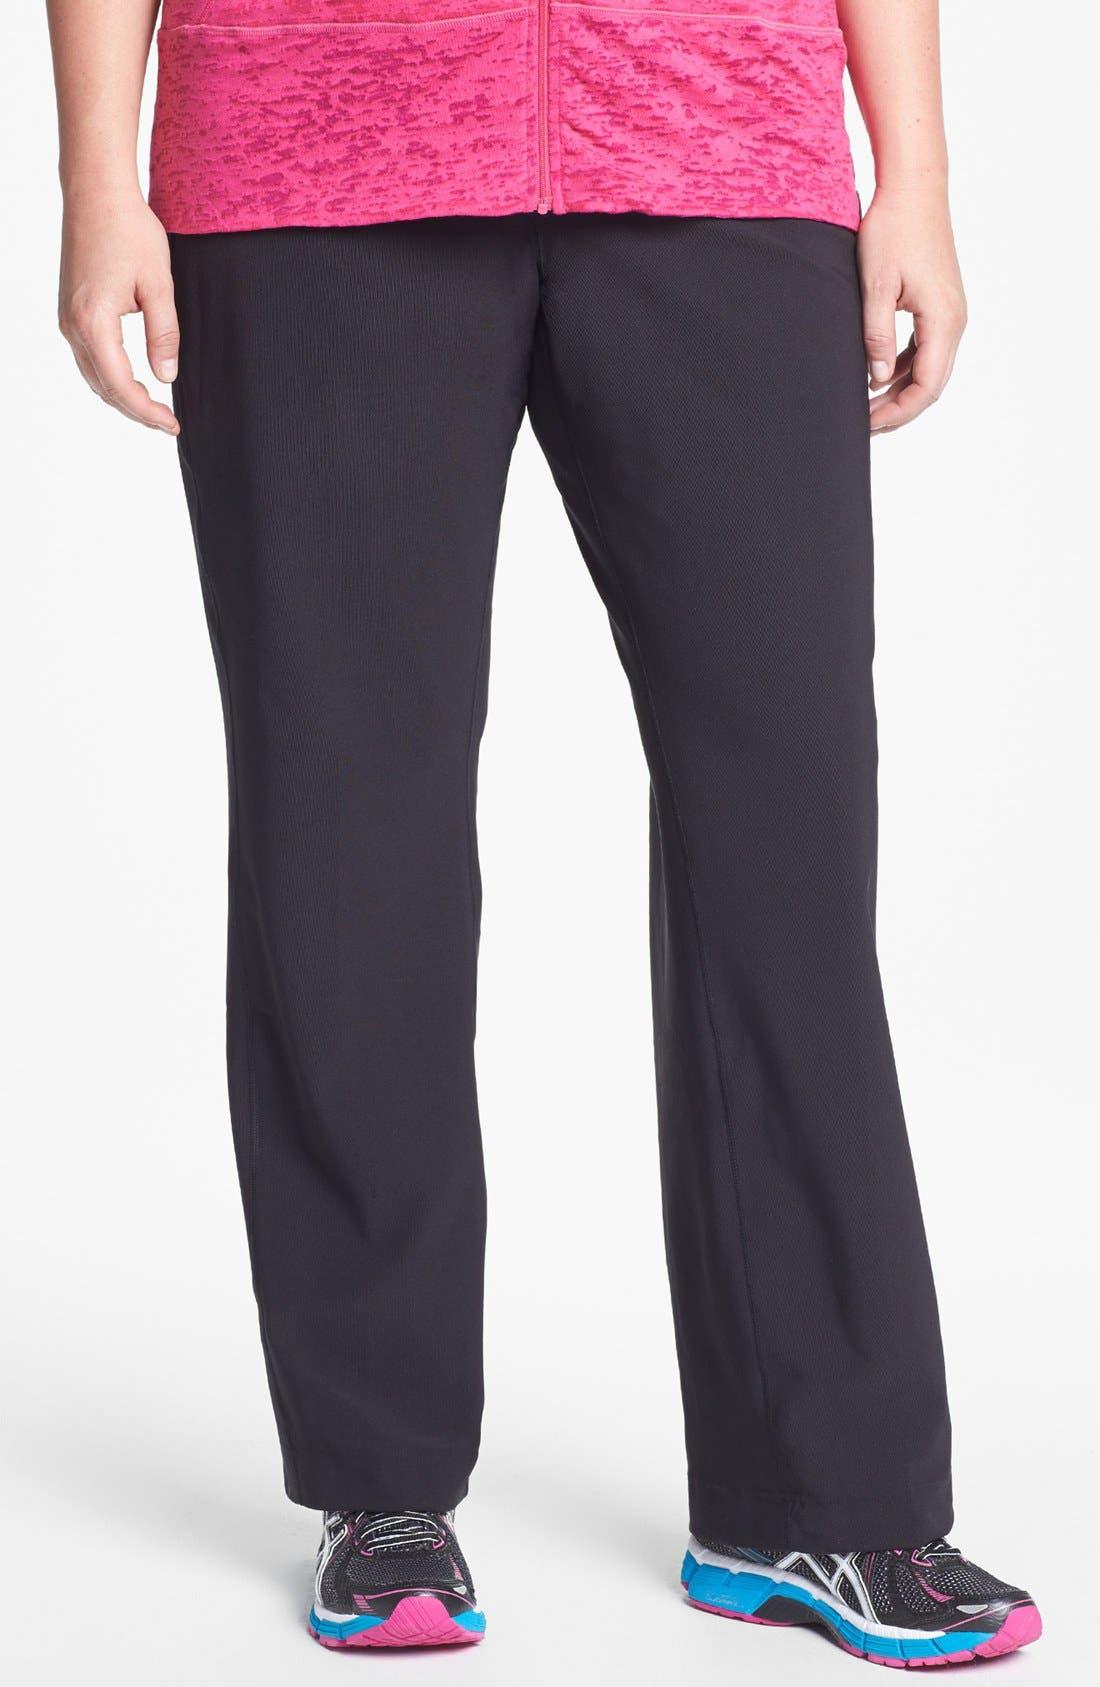 Alternate Image 1 Selected - Moving Comfort 'Fearless' Pants (Petite Plus)